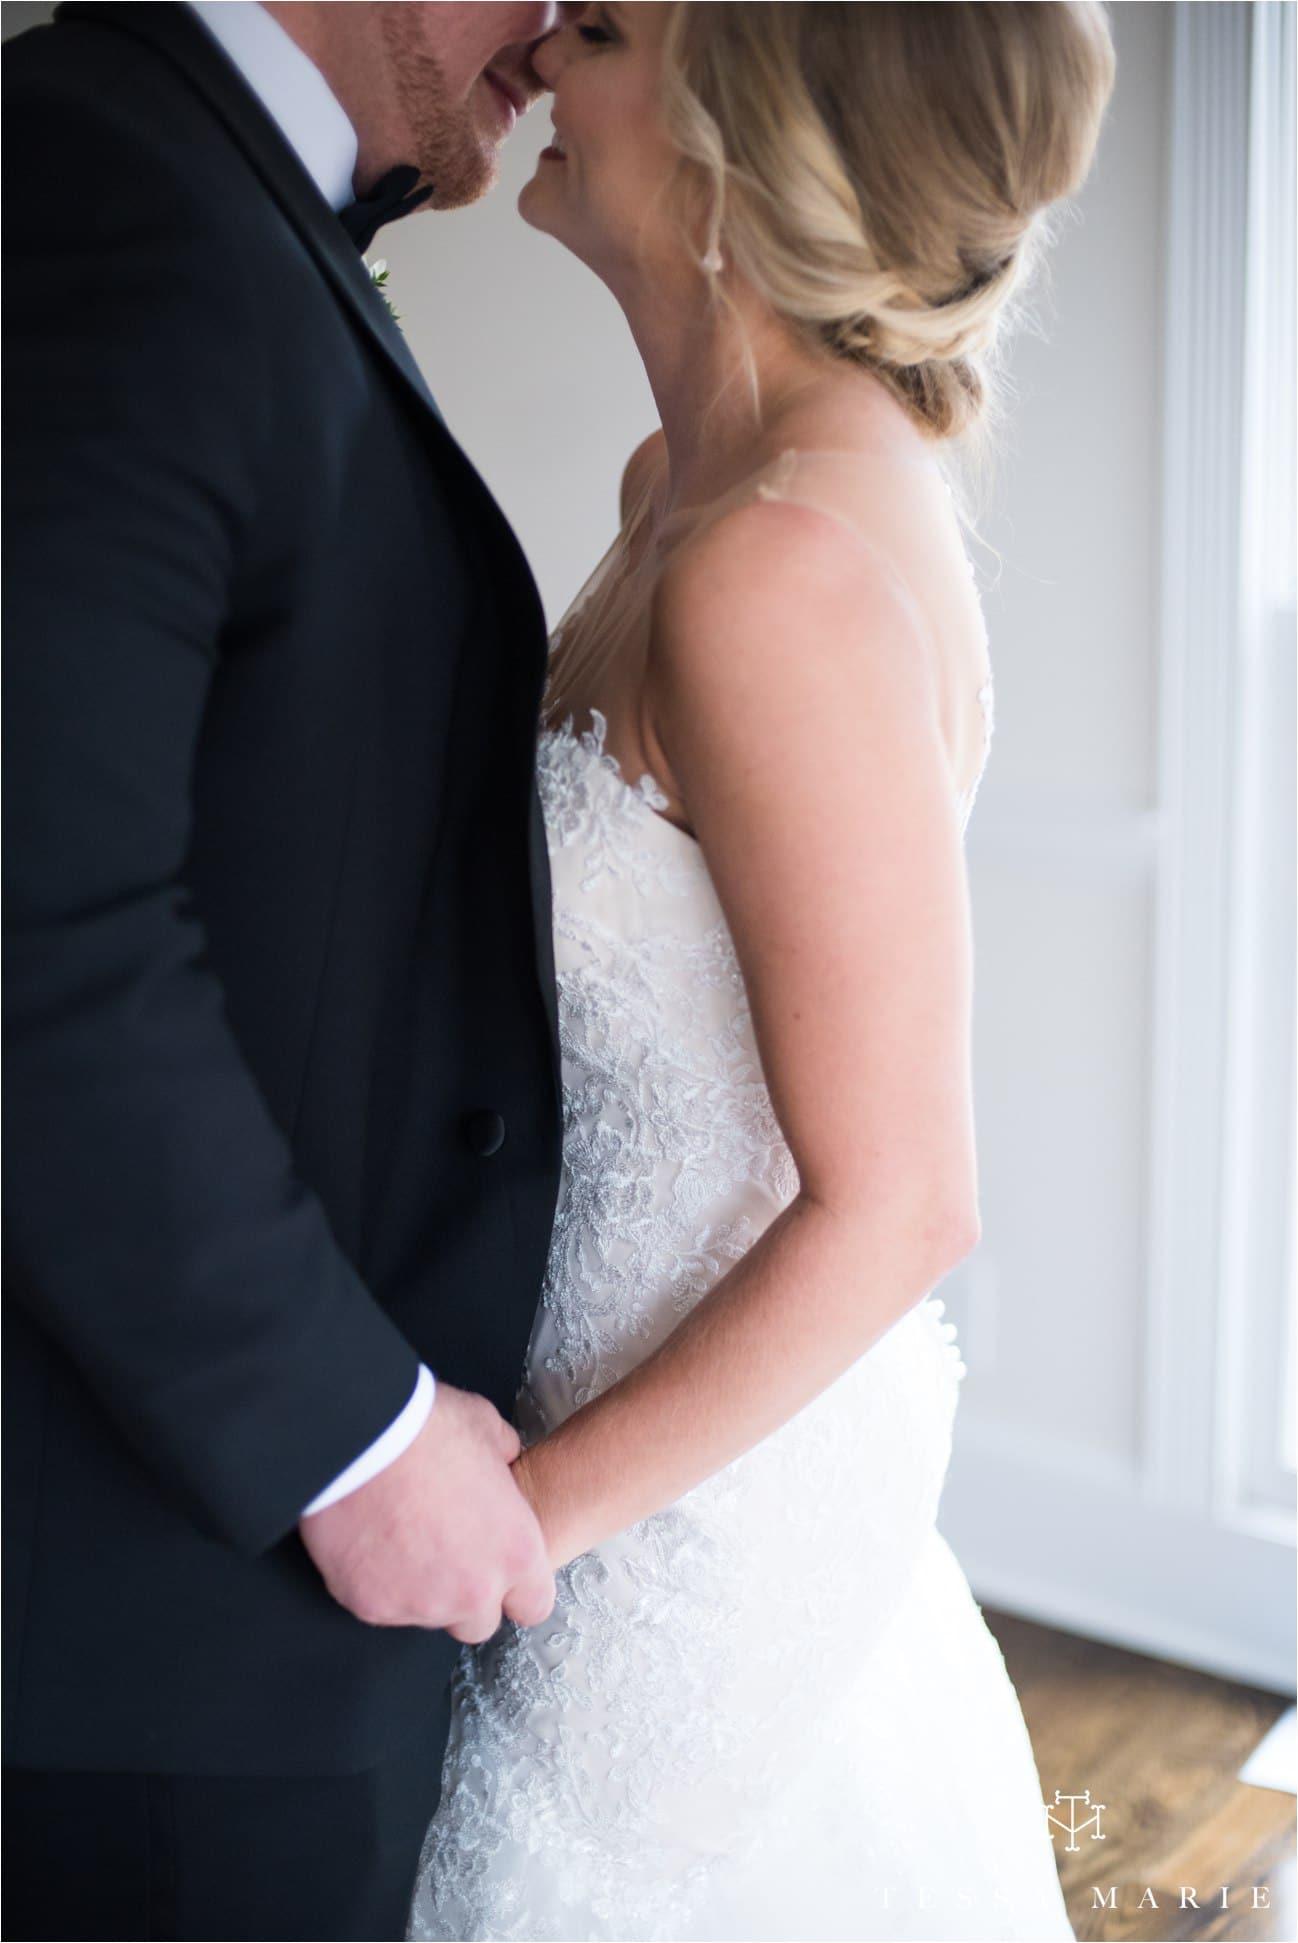 tessa_marie_studios_little_river_Farm_wedding_pictures_tessa_marie_weddings_0257